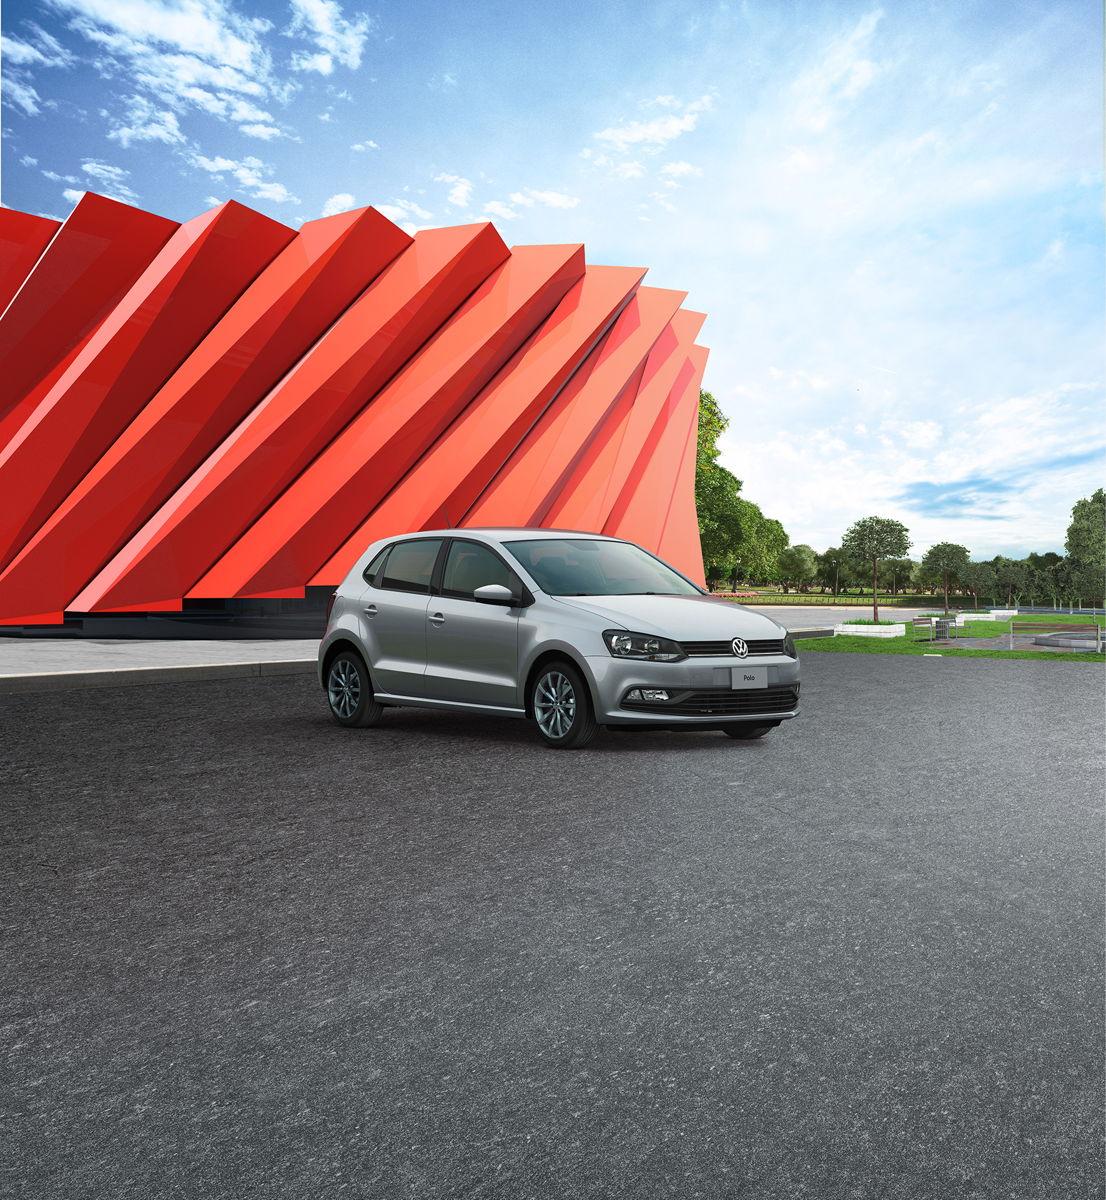 Toyota Corolla 2020 Llega A México Conoce Precios Y: Volkswagen Polo 2019 Llega A México